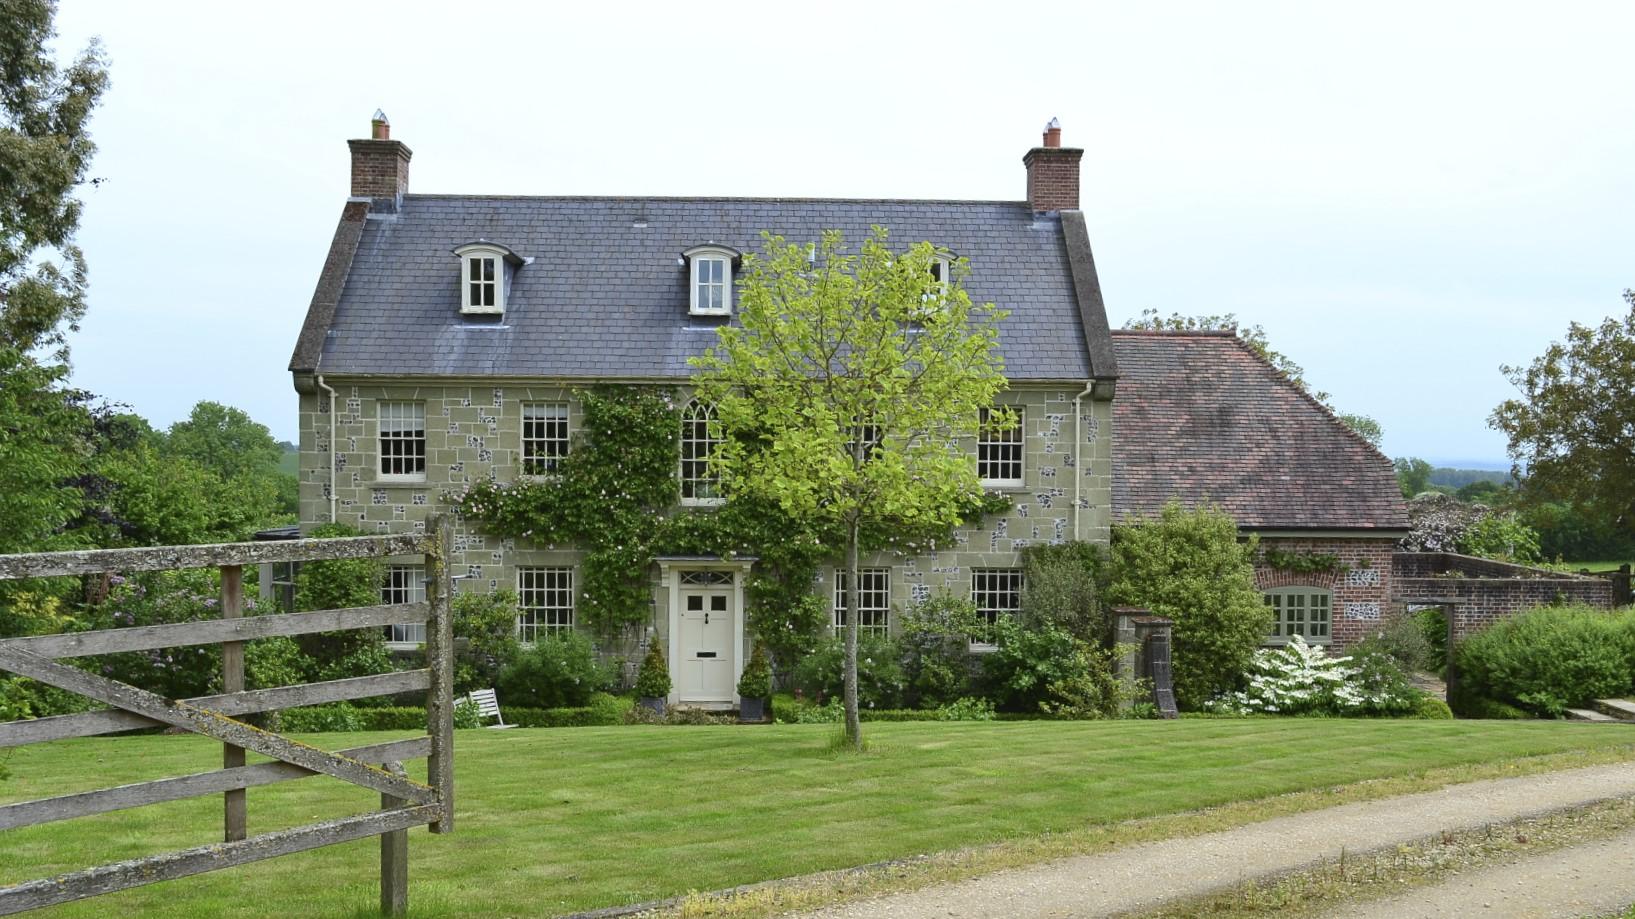 Lynchet House